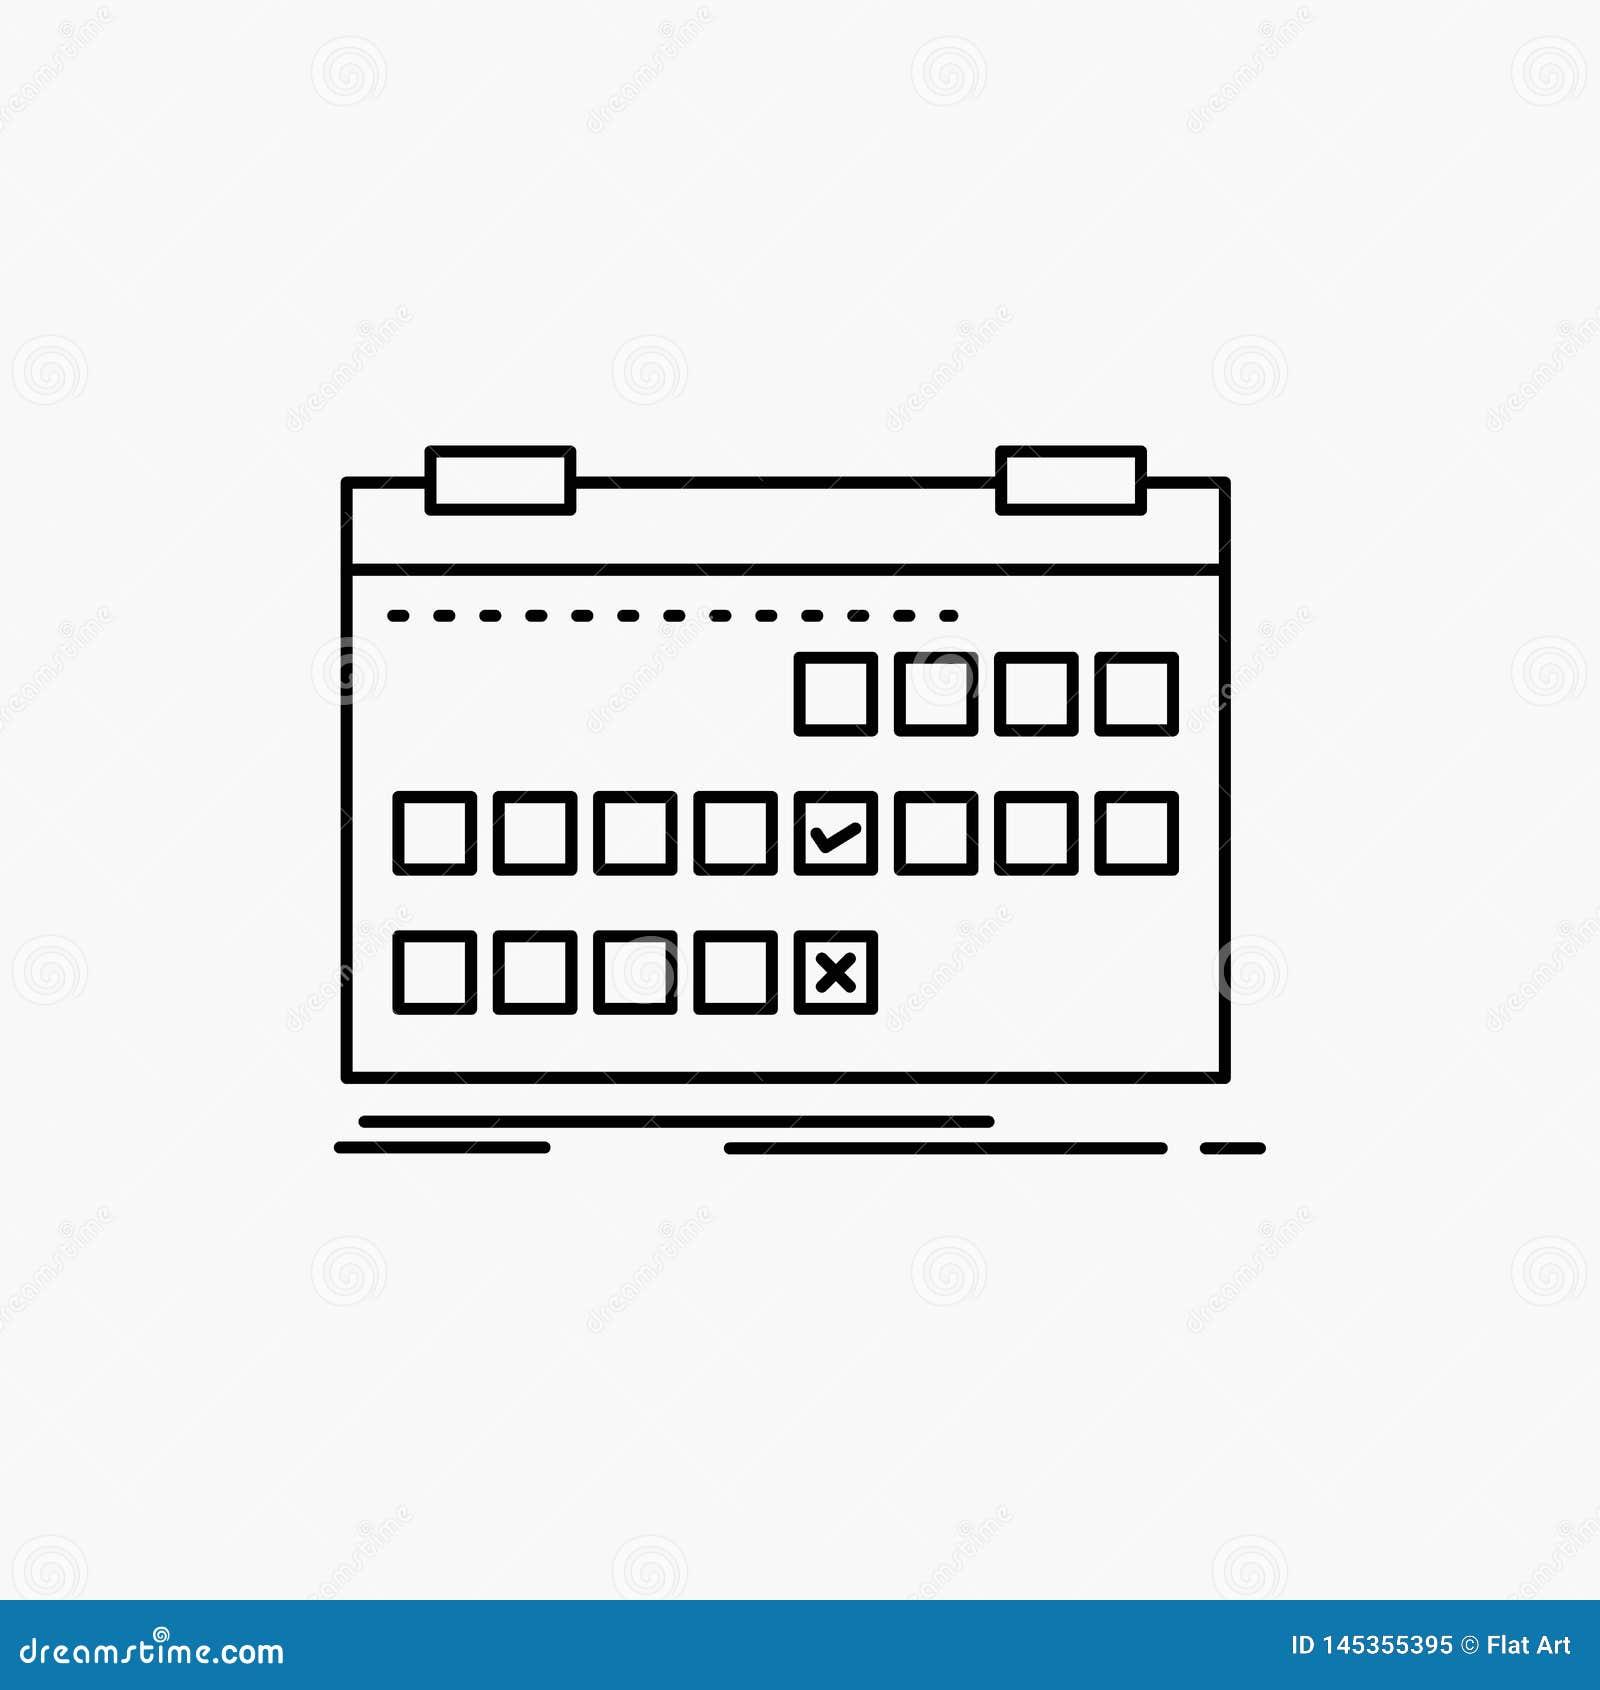 Kalender datum, h?ndelse, frig?rare, schemalinje symbol Vektor isolerad illustration